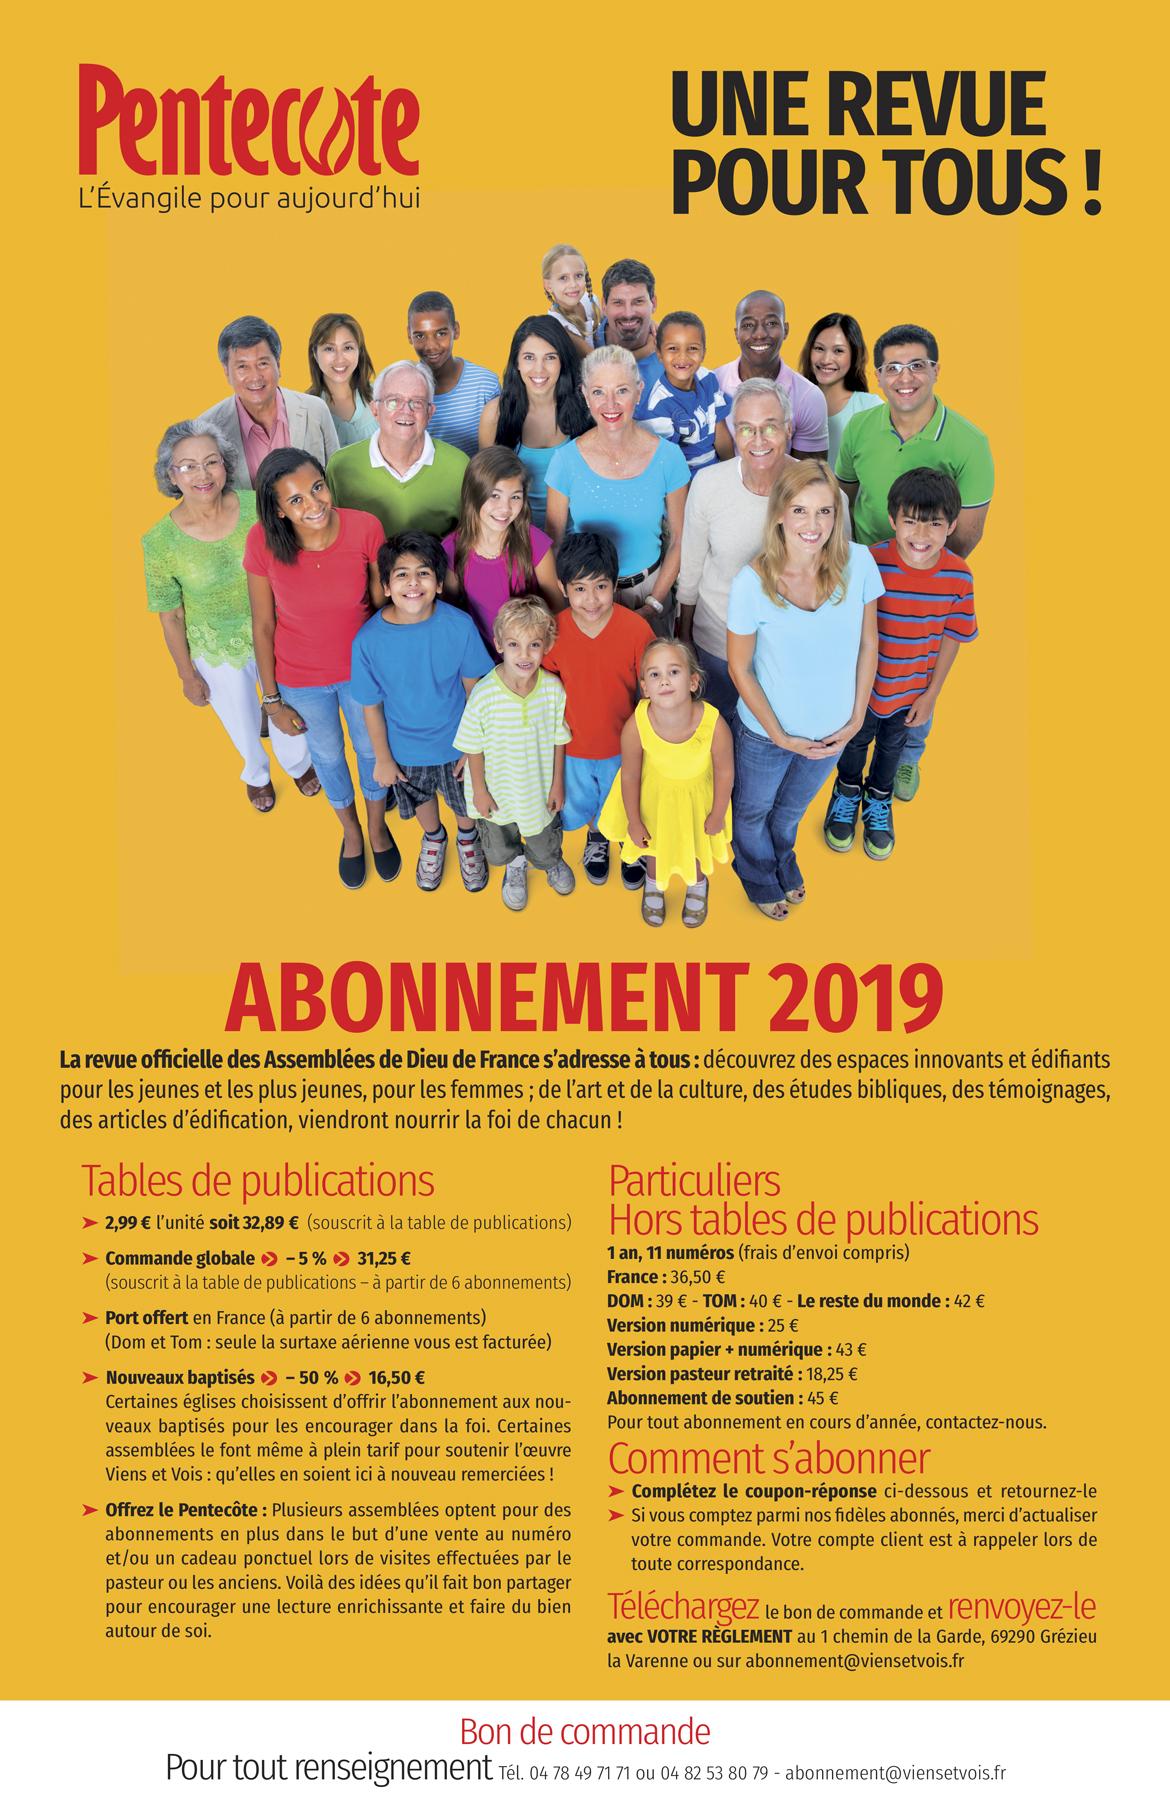 Abonnement 2019